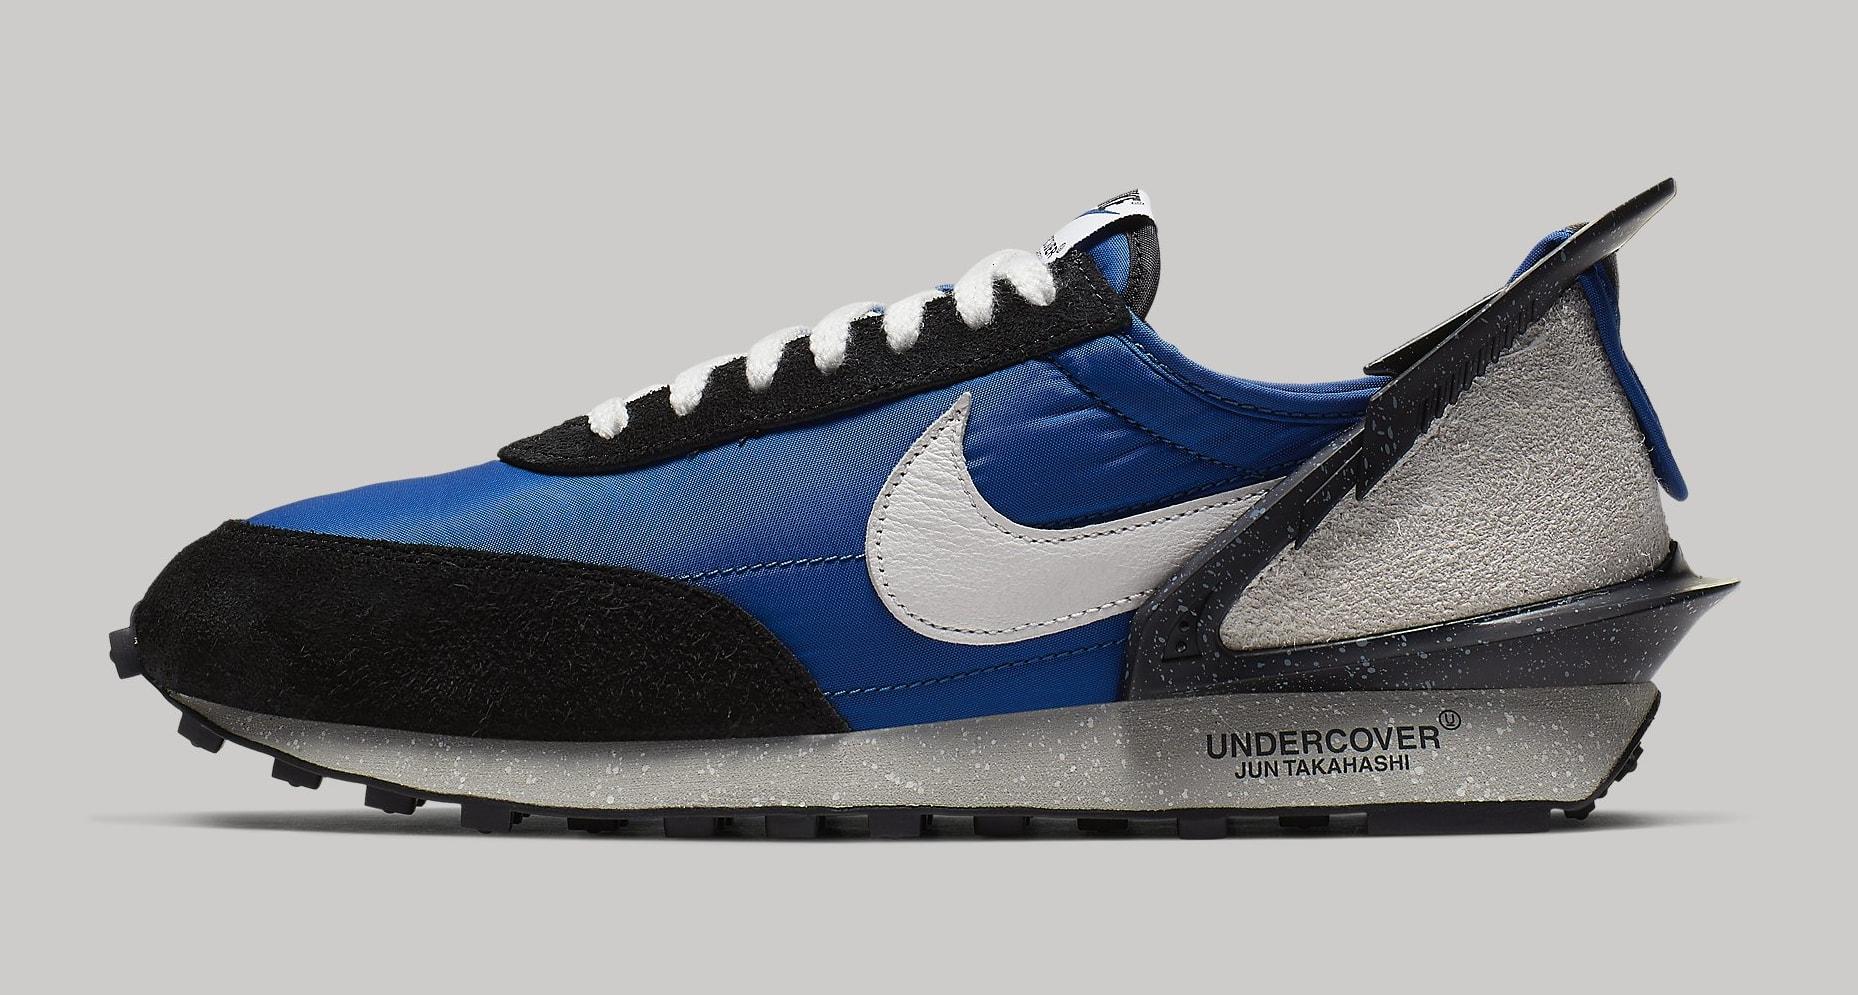 Undercover x Nike Daybreak Blue Jay/Summit White-Black BV4594-400 Lateral